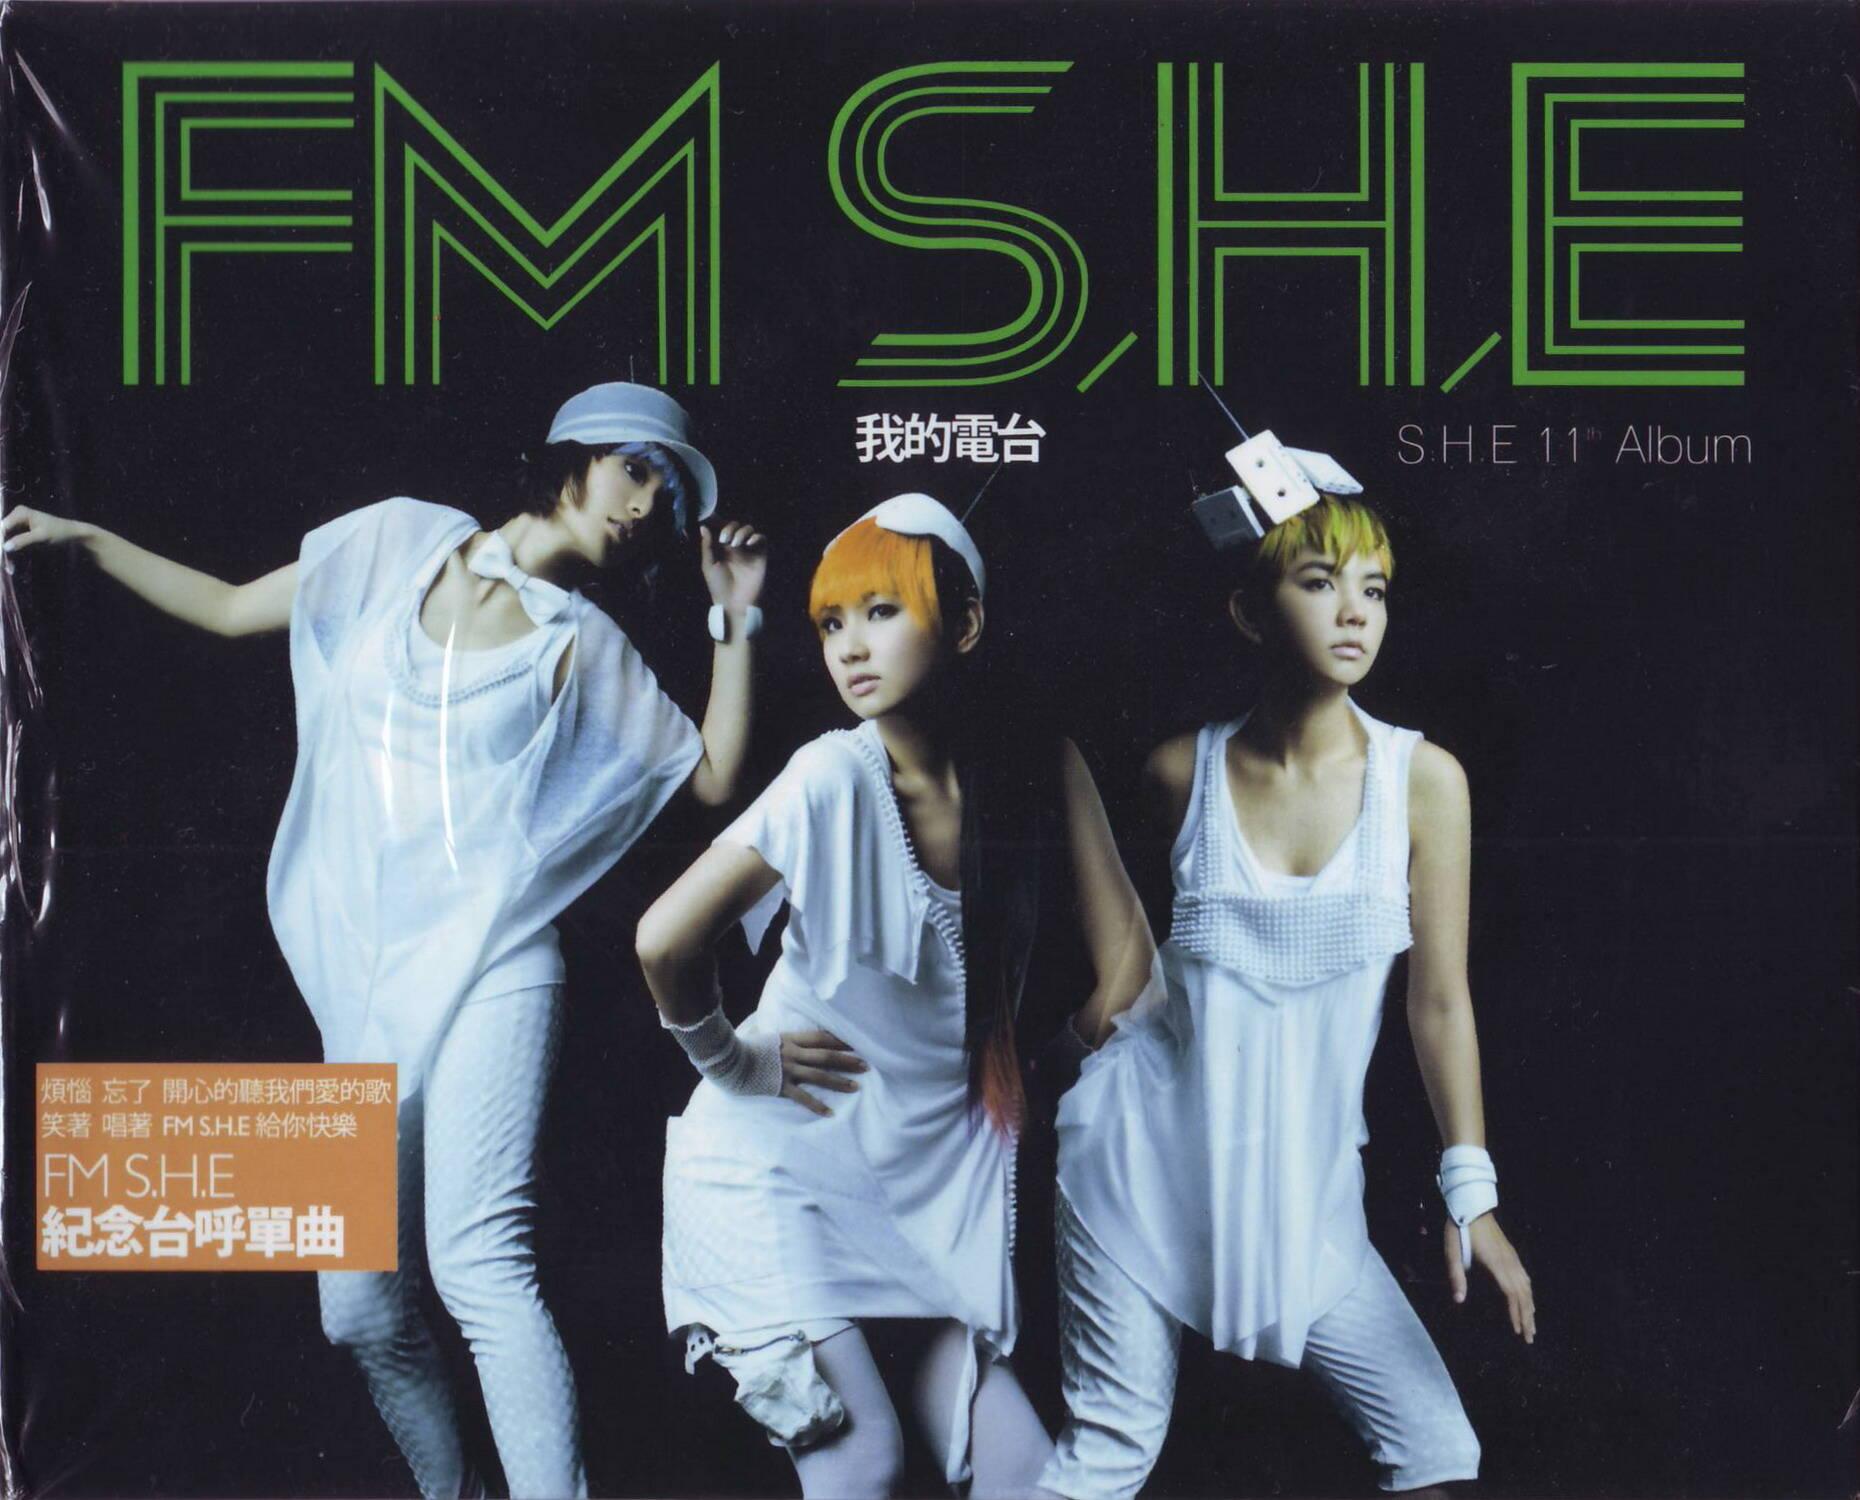 S.H.E – 我的電臺 紀念臺唿單曲 (EP) (2008) [FLAC 分軌]